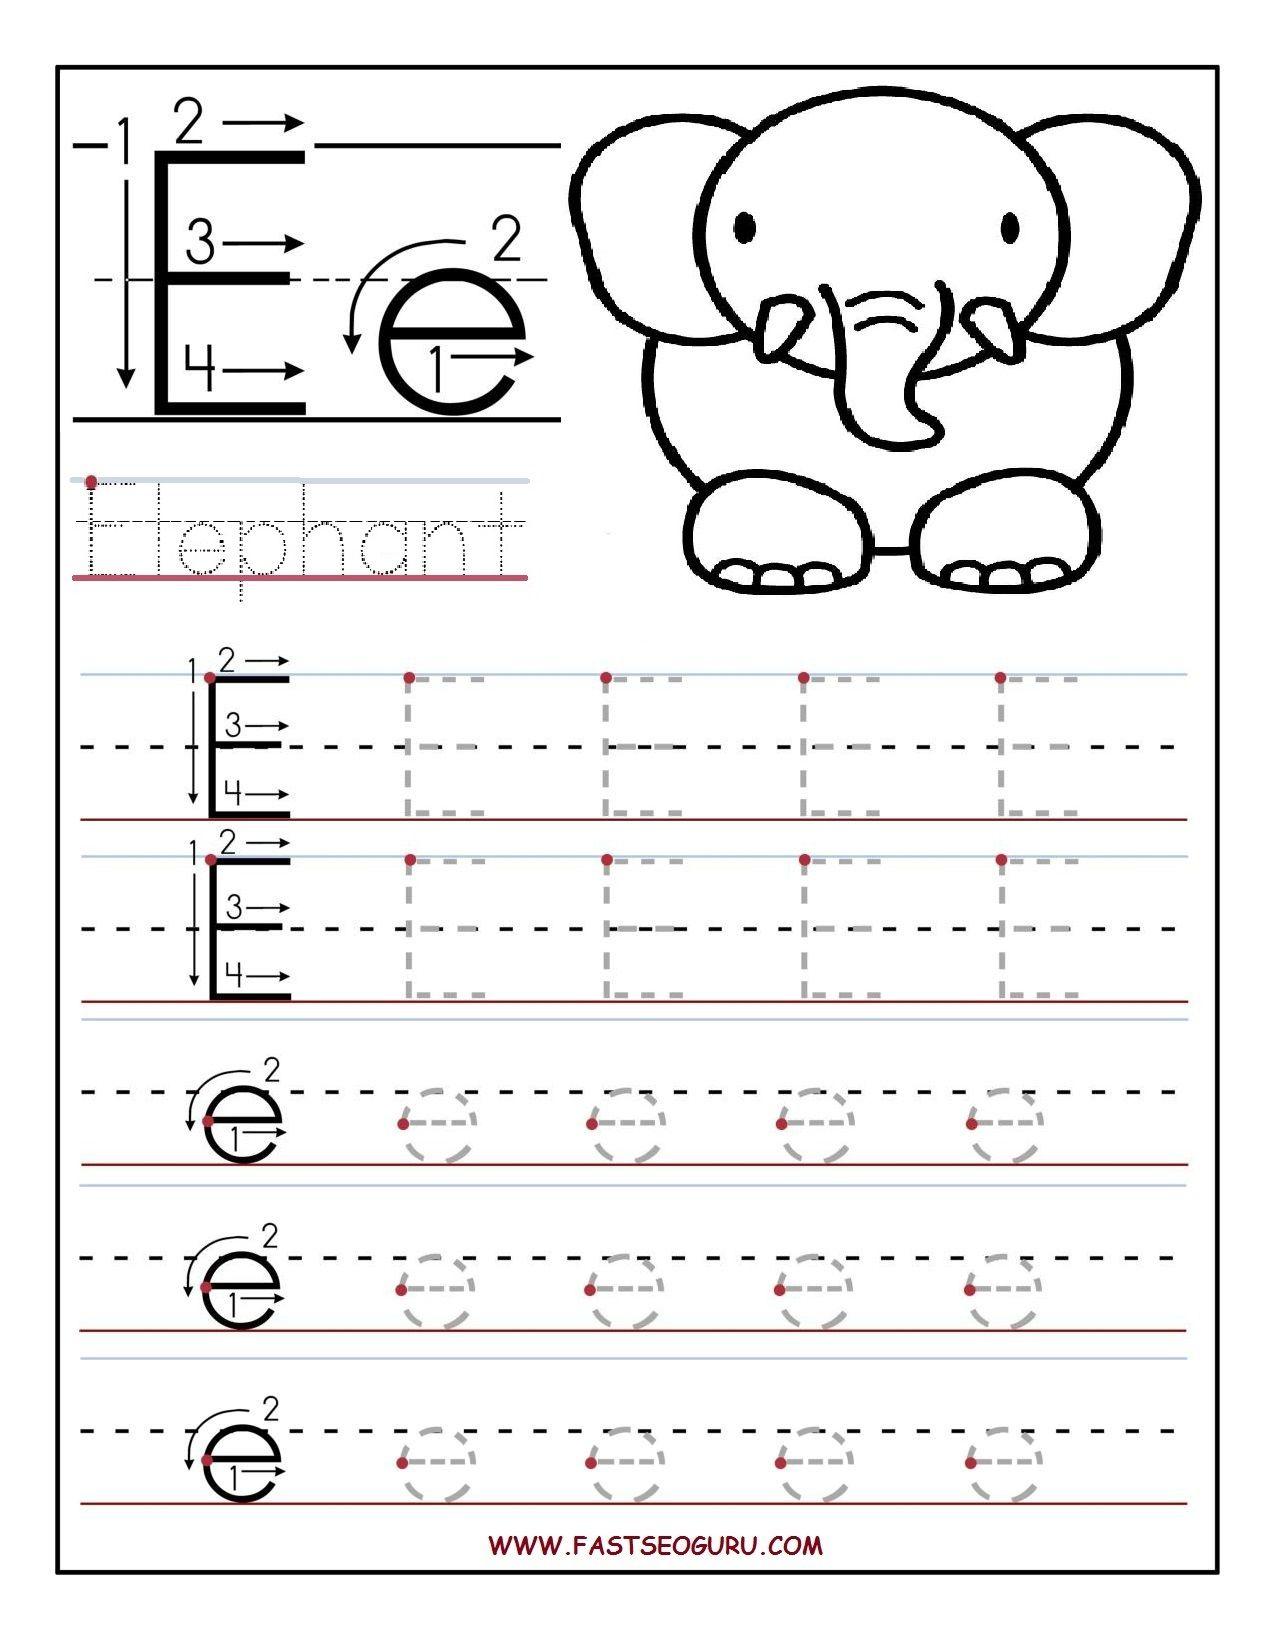 Pinvilfran Gason On Decor | Preschool Worksheets, Letter for Tracing Alphabet Letters Online